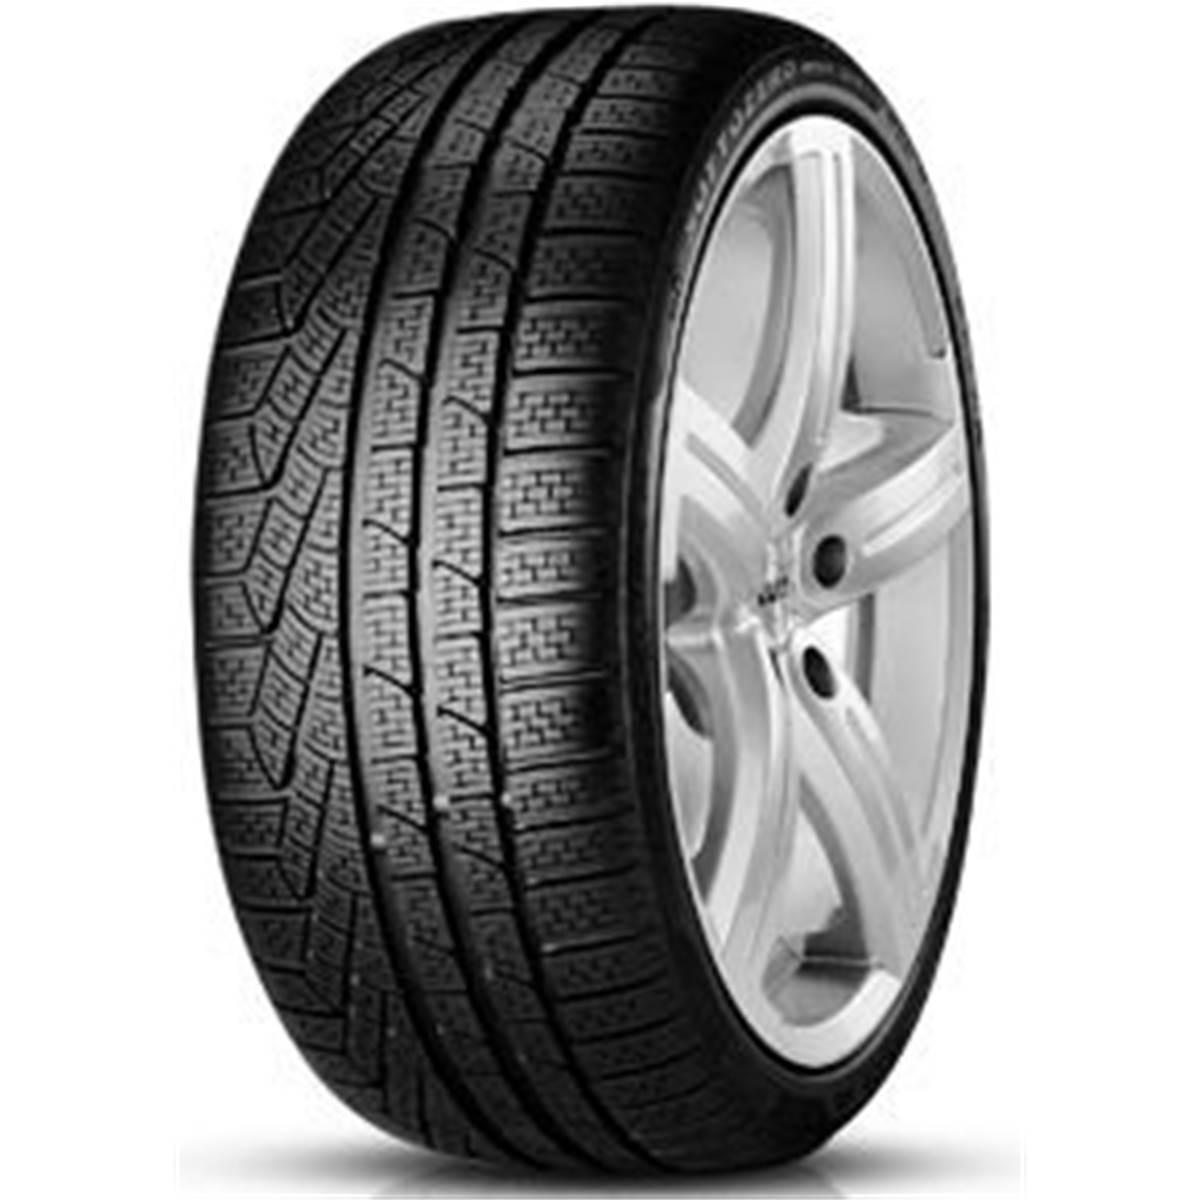 Pneu Hiver Pirelli 205/50R17 93H Winter 210 Snowsport XL